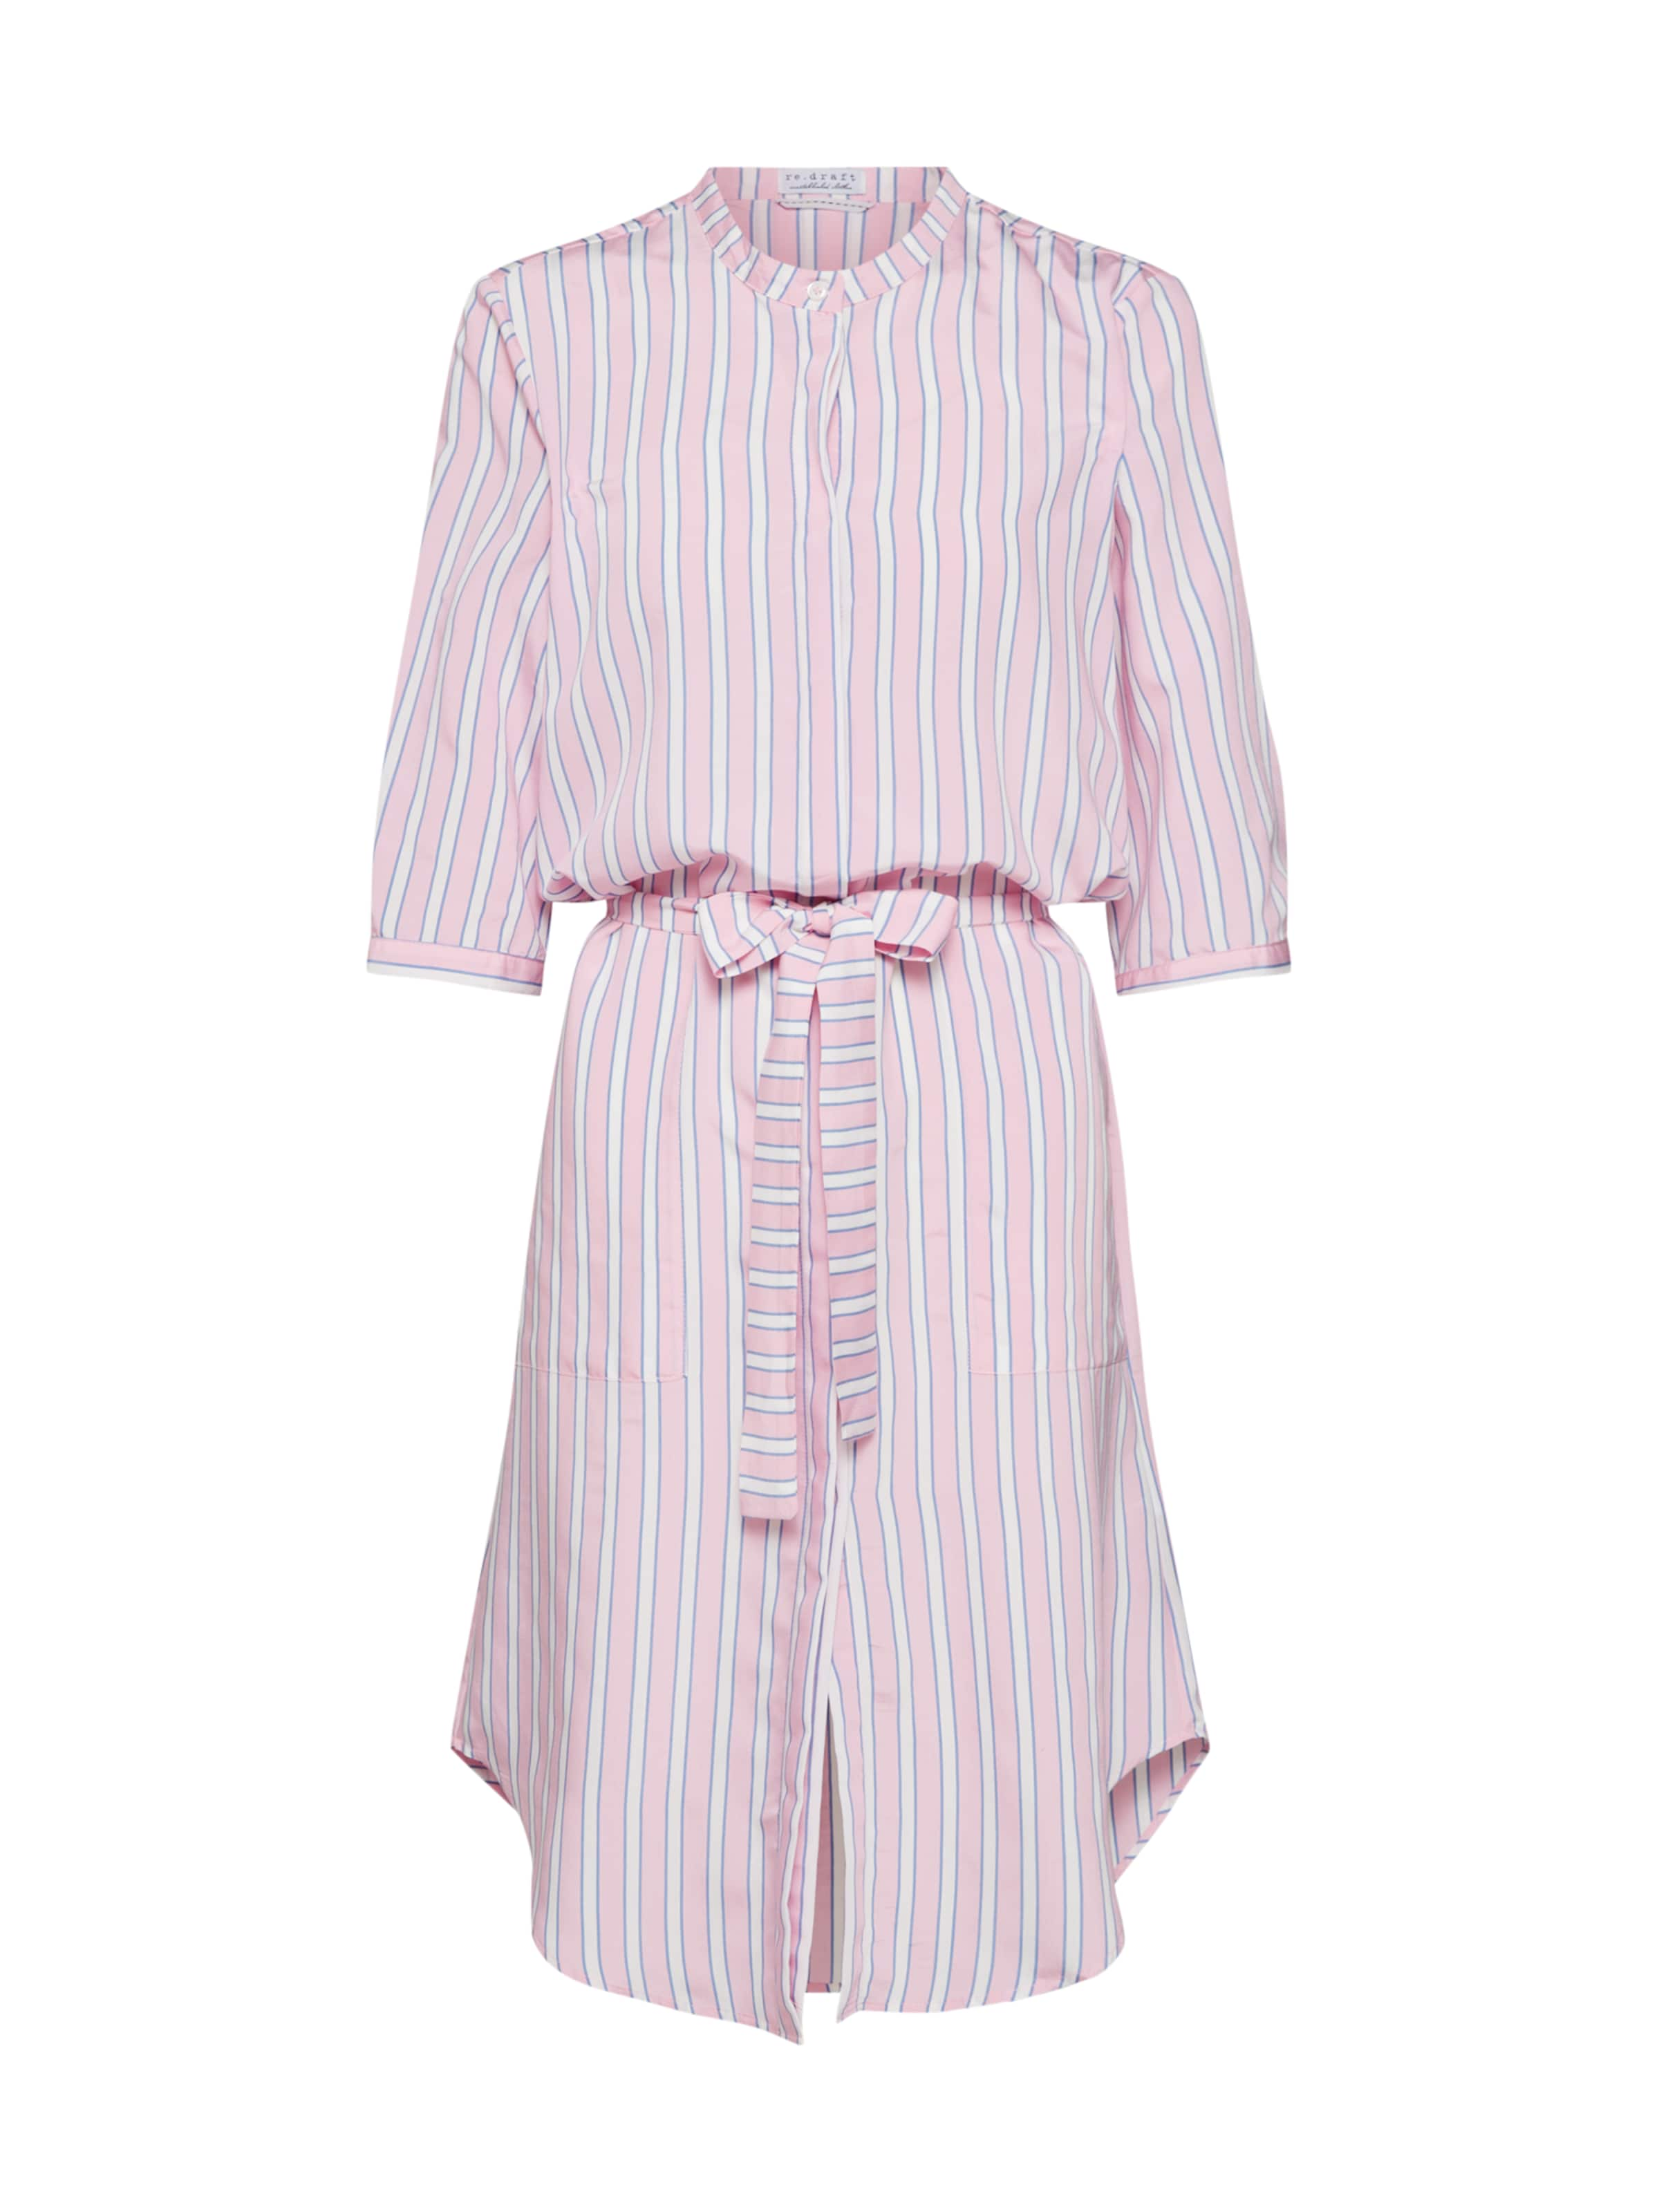 Kleider In Re Kleider PinkRosa In PinkRosa Re draft draft OPNkw8Xn0